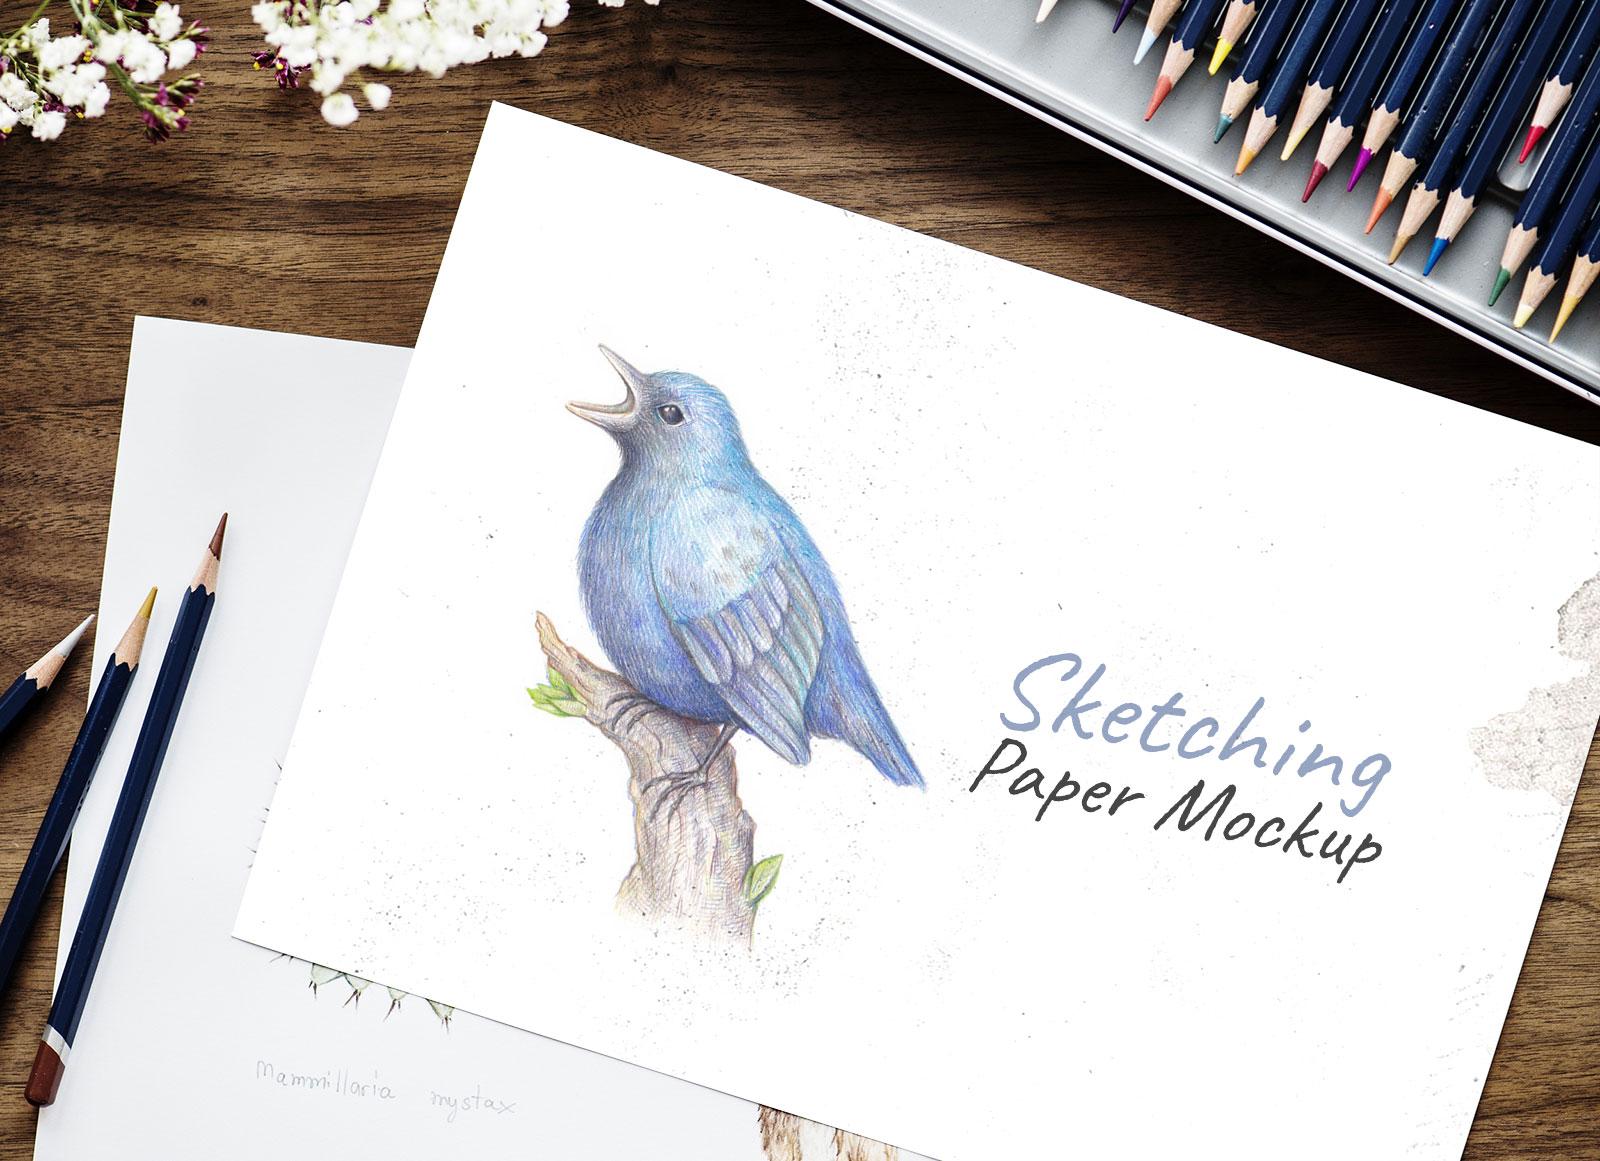 Free-Sketching-Drawing-Paper-Mockup-PSD-2